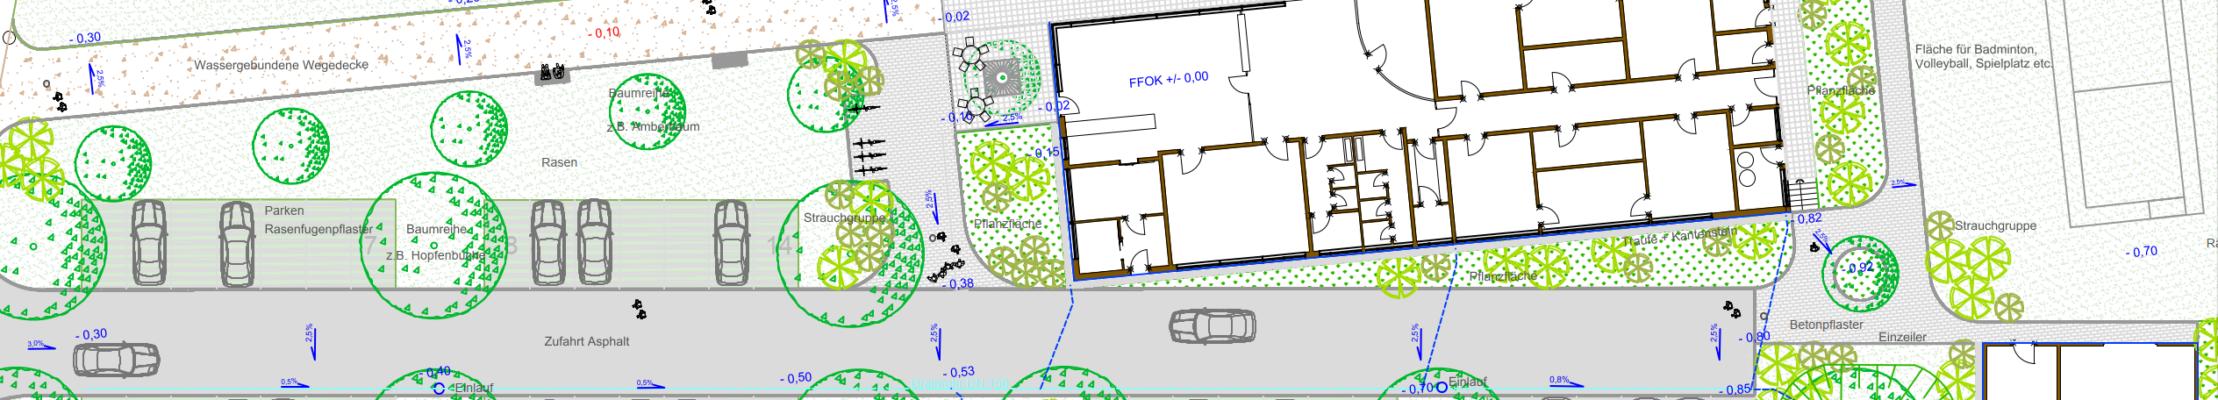 Sportplatz Plan